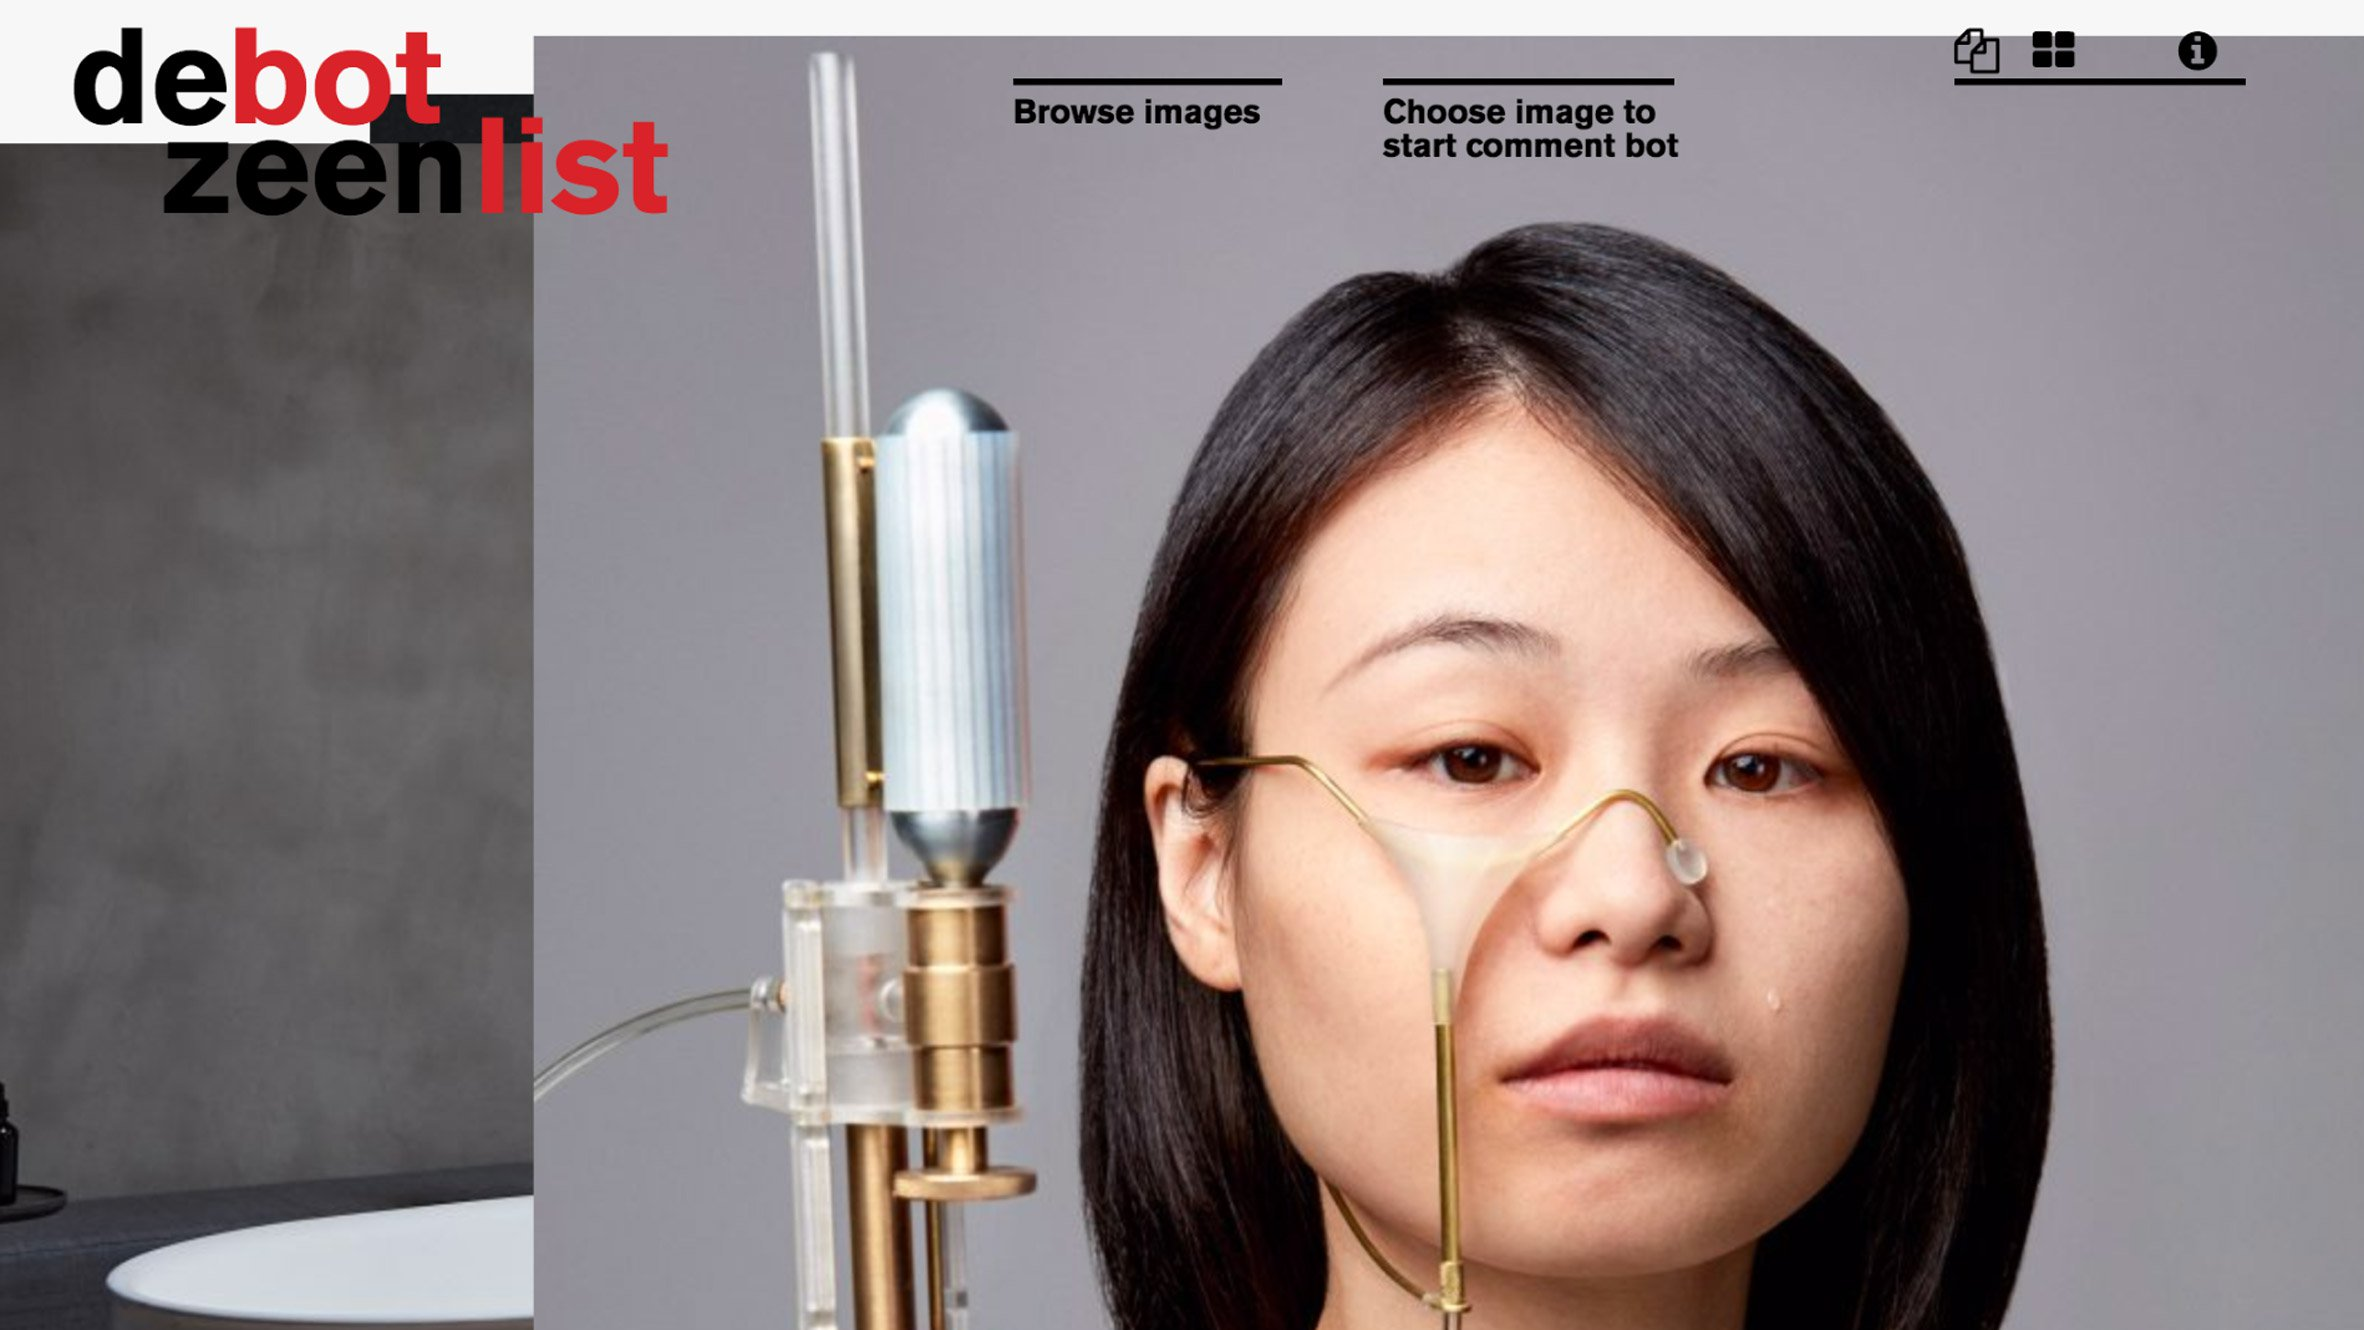 dezeen-bot-list-hot-list-design-academy-eindhoven-milan-design-week-_dezeen_2364_col_0.jpg